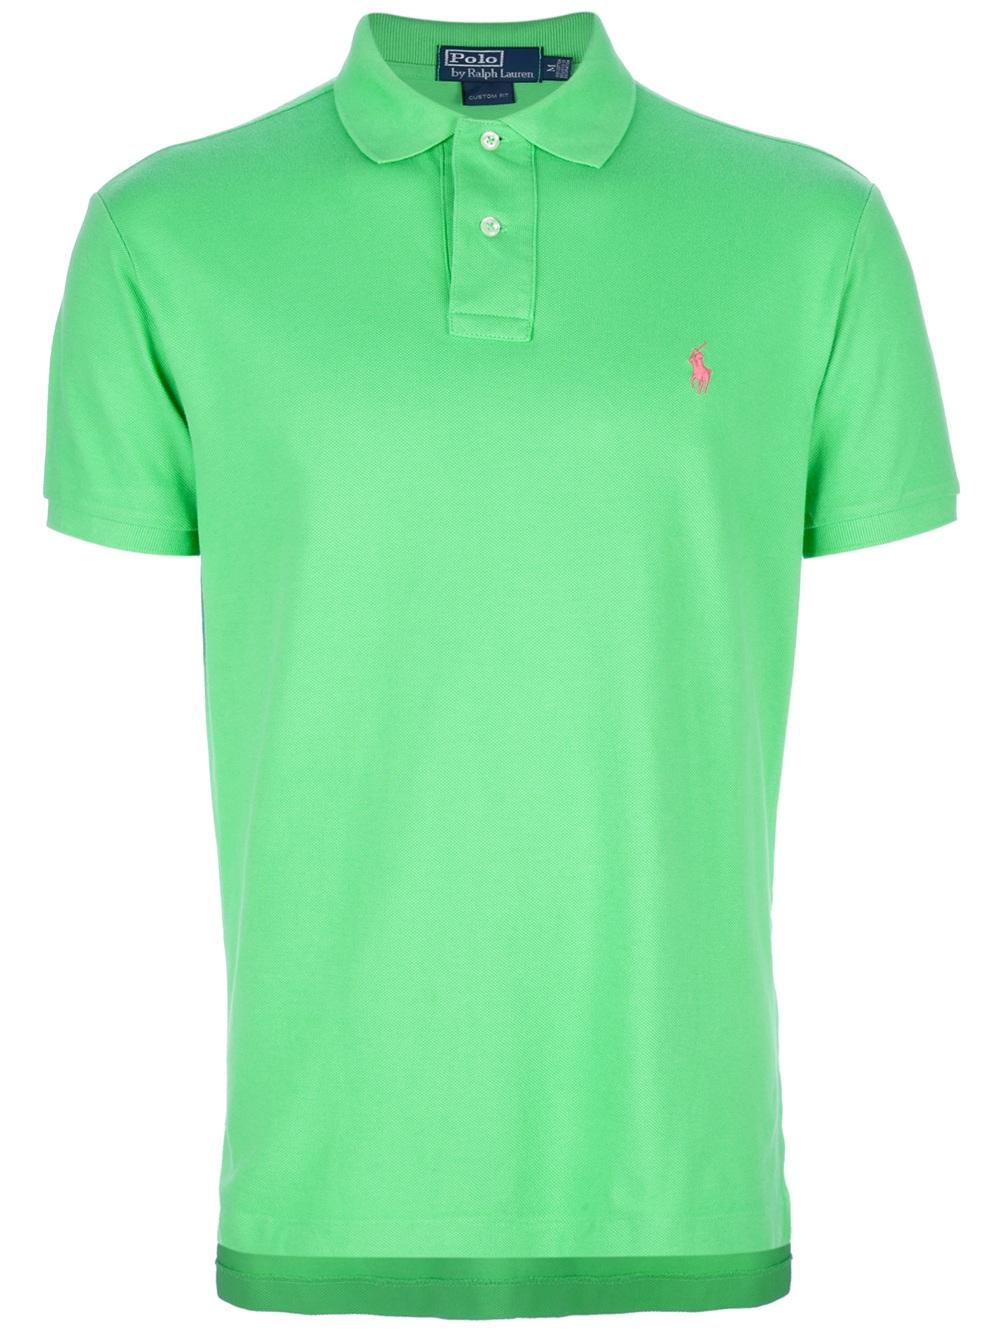 Lyst polo ralph lauren logo polo shirt in green for men for Ralph lauren logo shirt